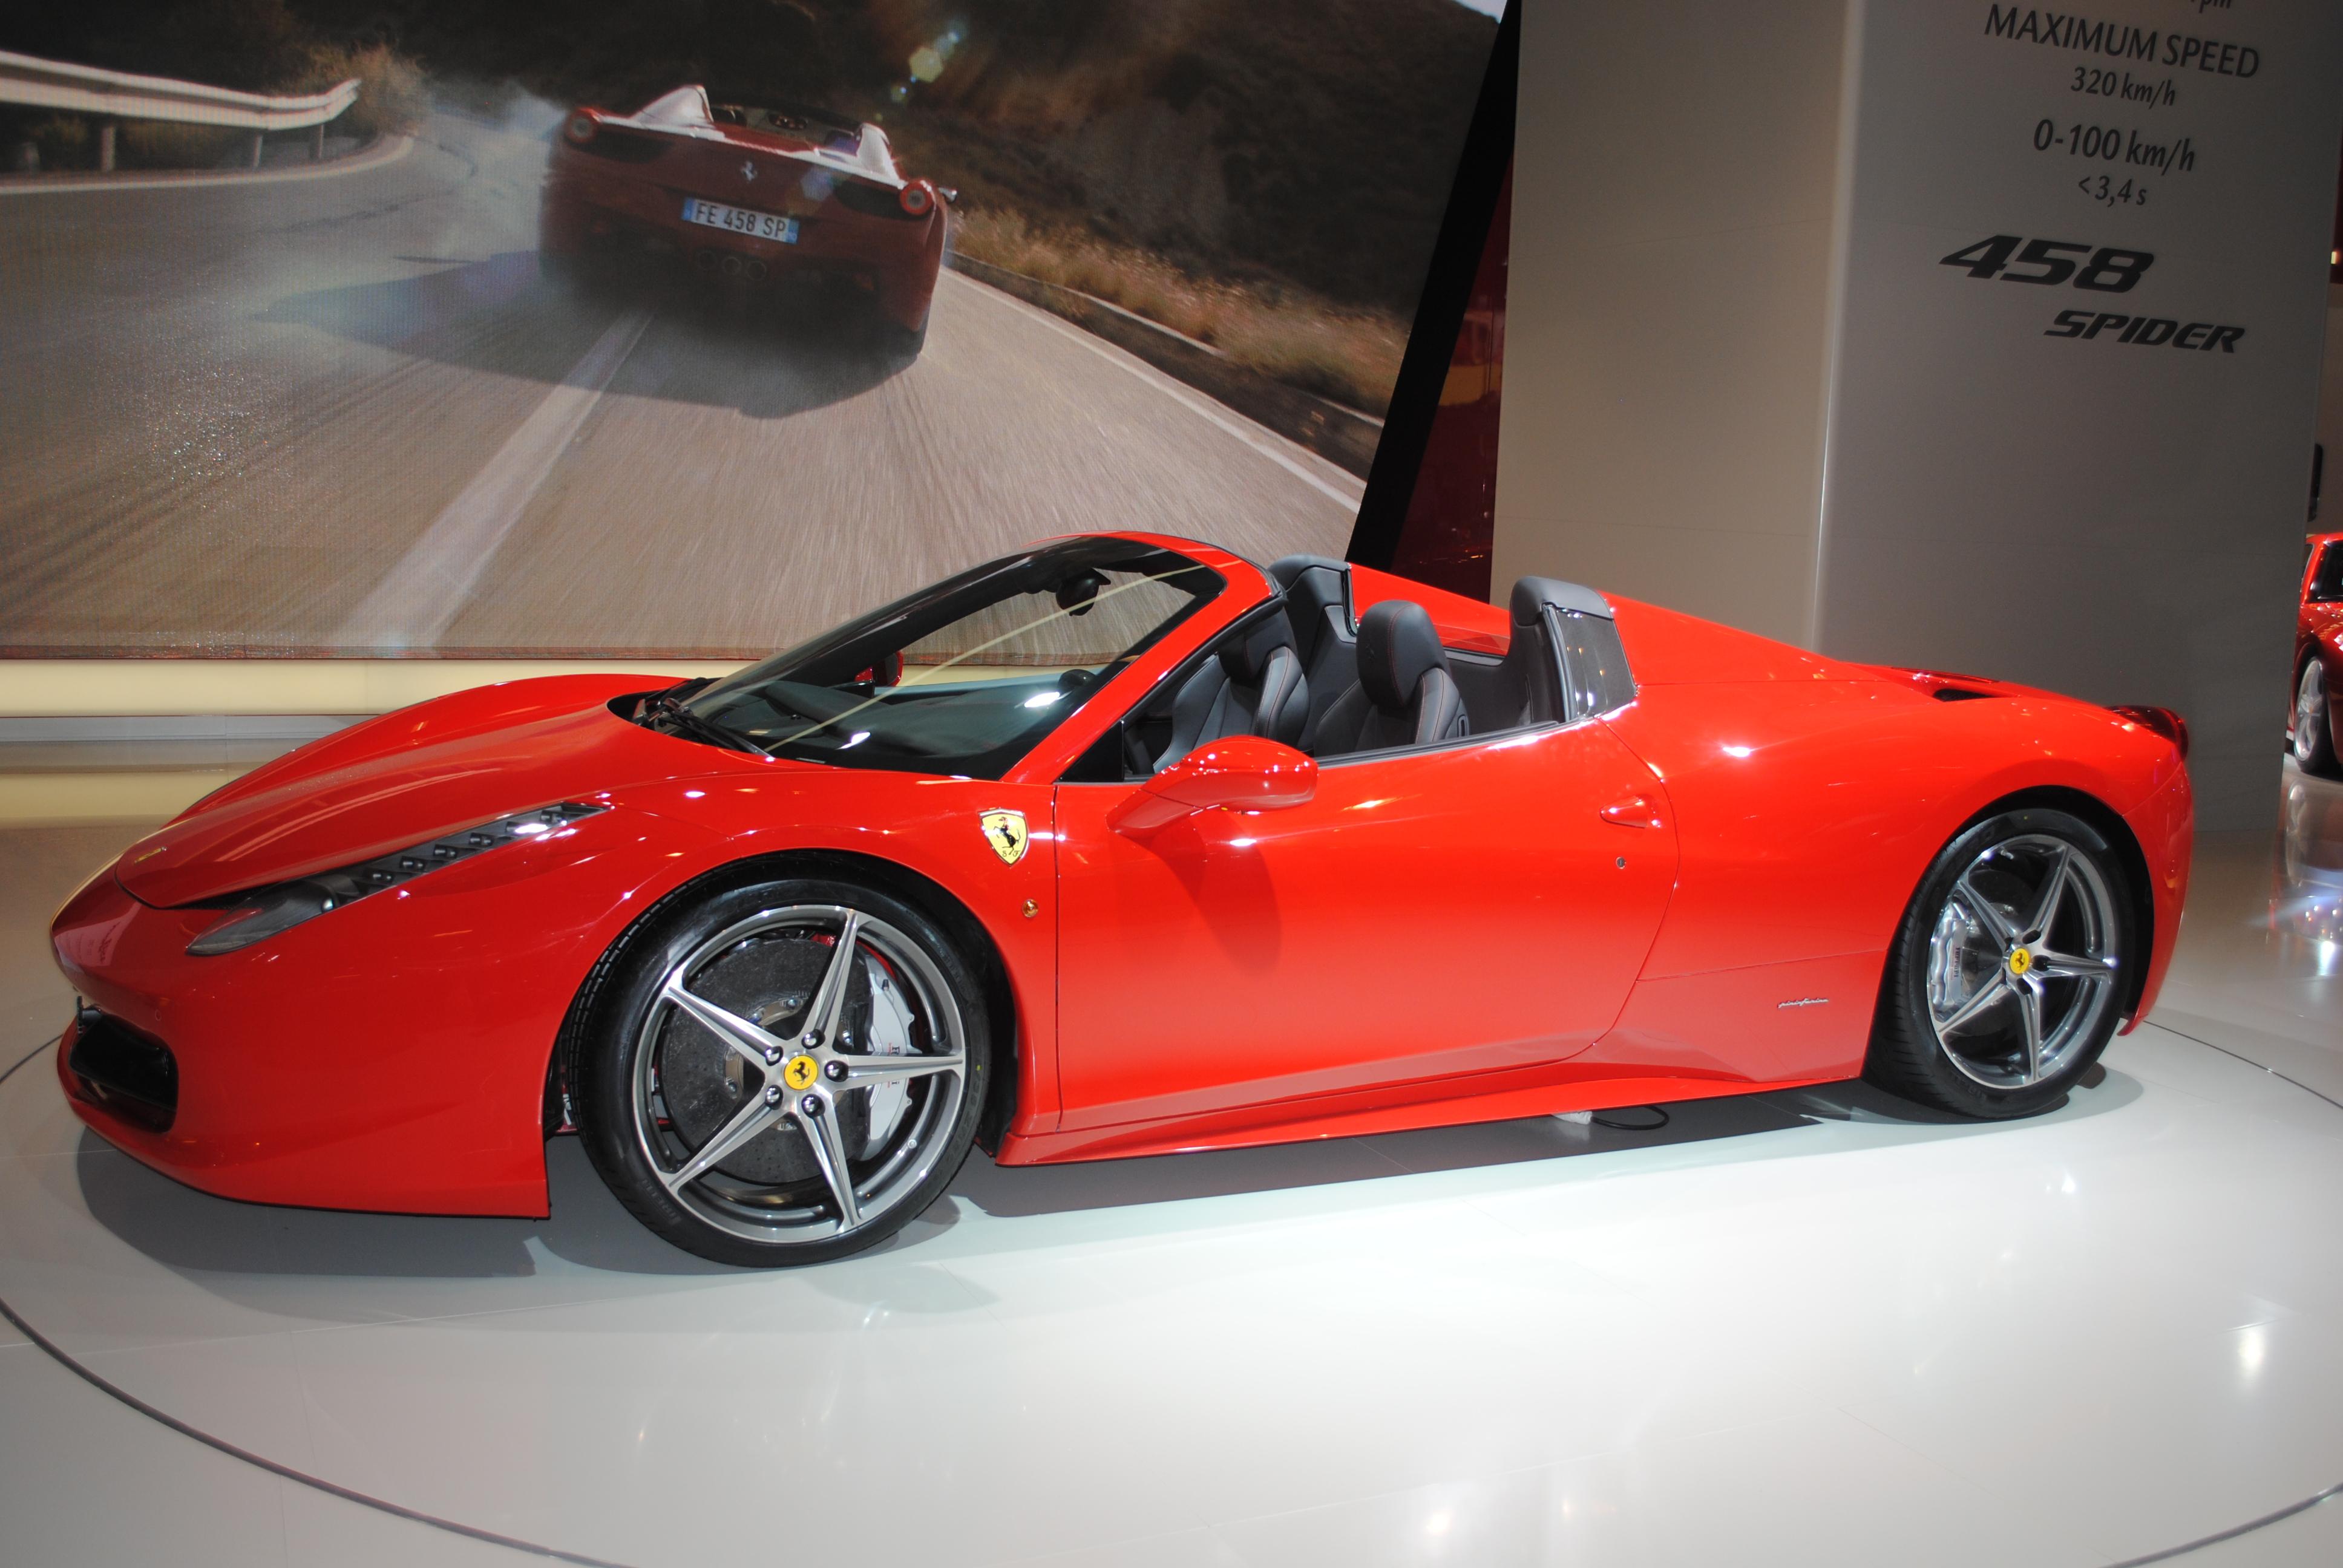 File Ferrari 458 Spider At The Frankfurt Motor Show Iaa 2011 6143716891 Jpg Wikimedia Commons